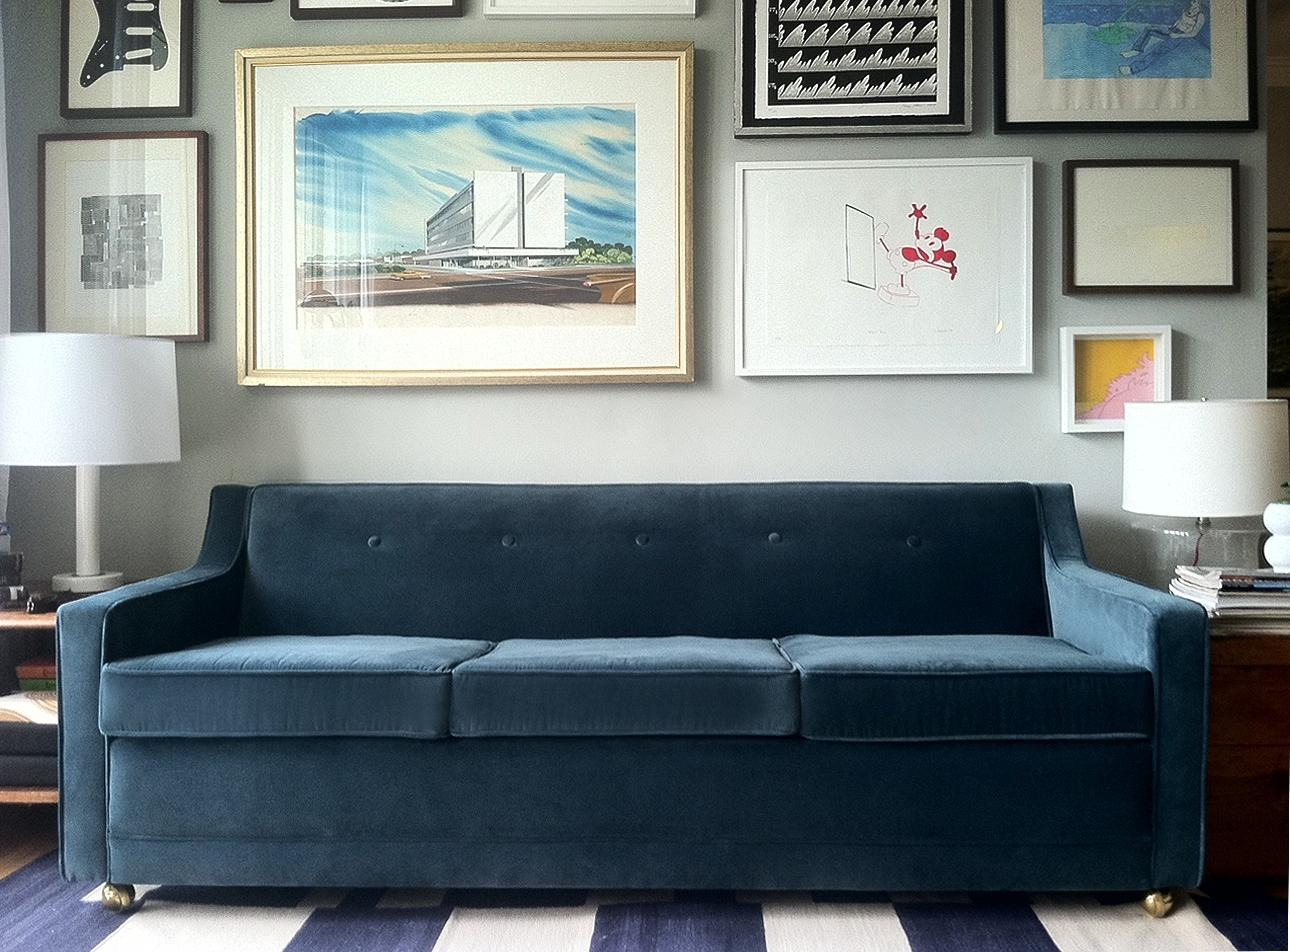 Awesome Blue Velvet Sofa — Home Design Stylinghome Design Styling In Awesome Sofa (View 14 of 20)